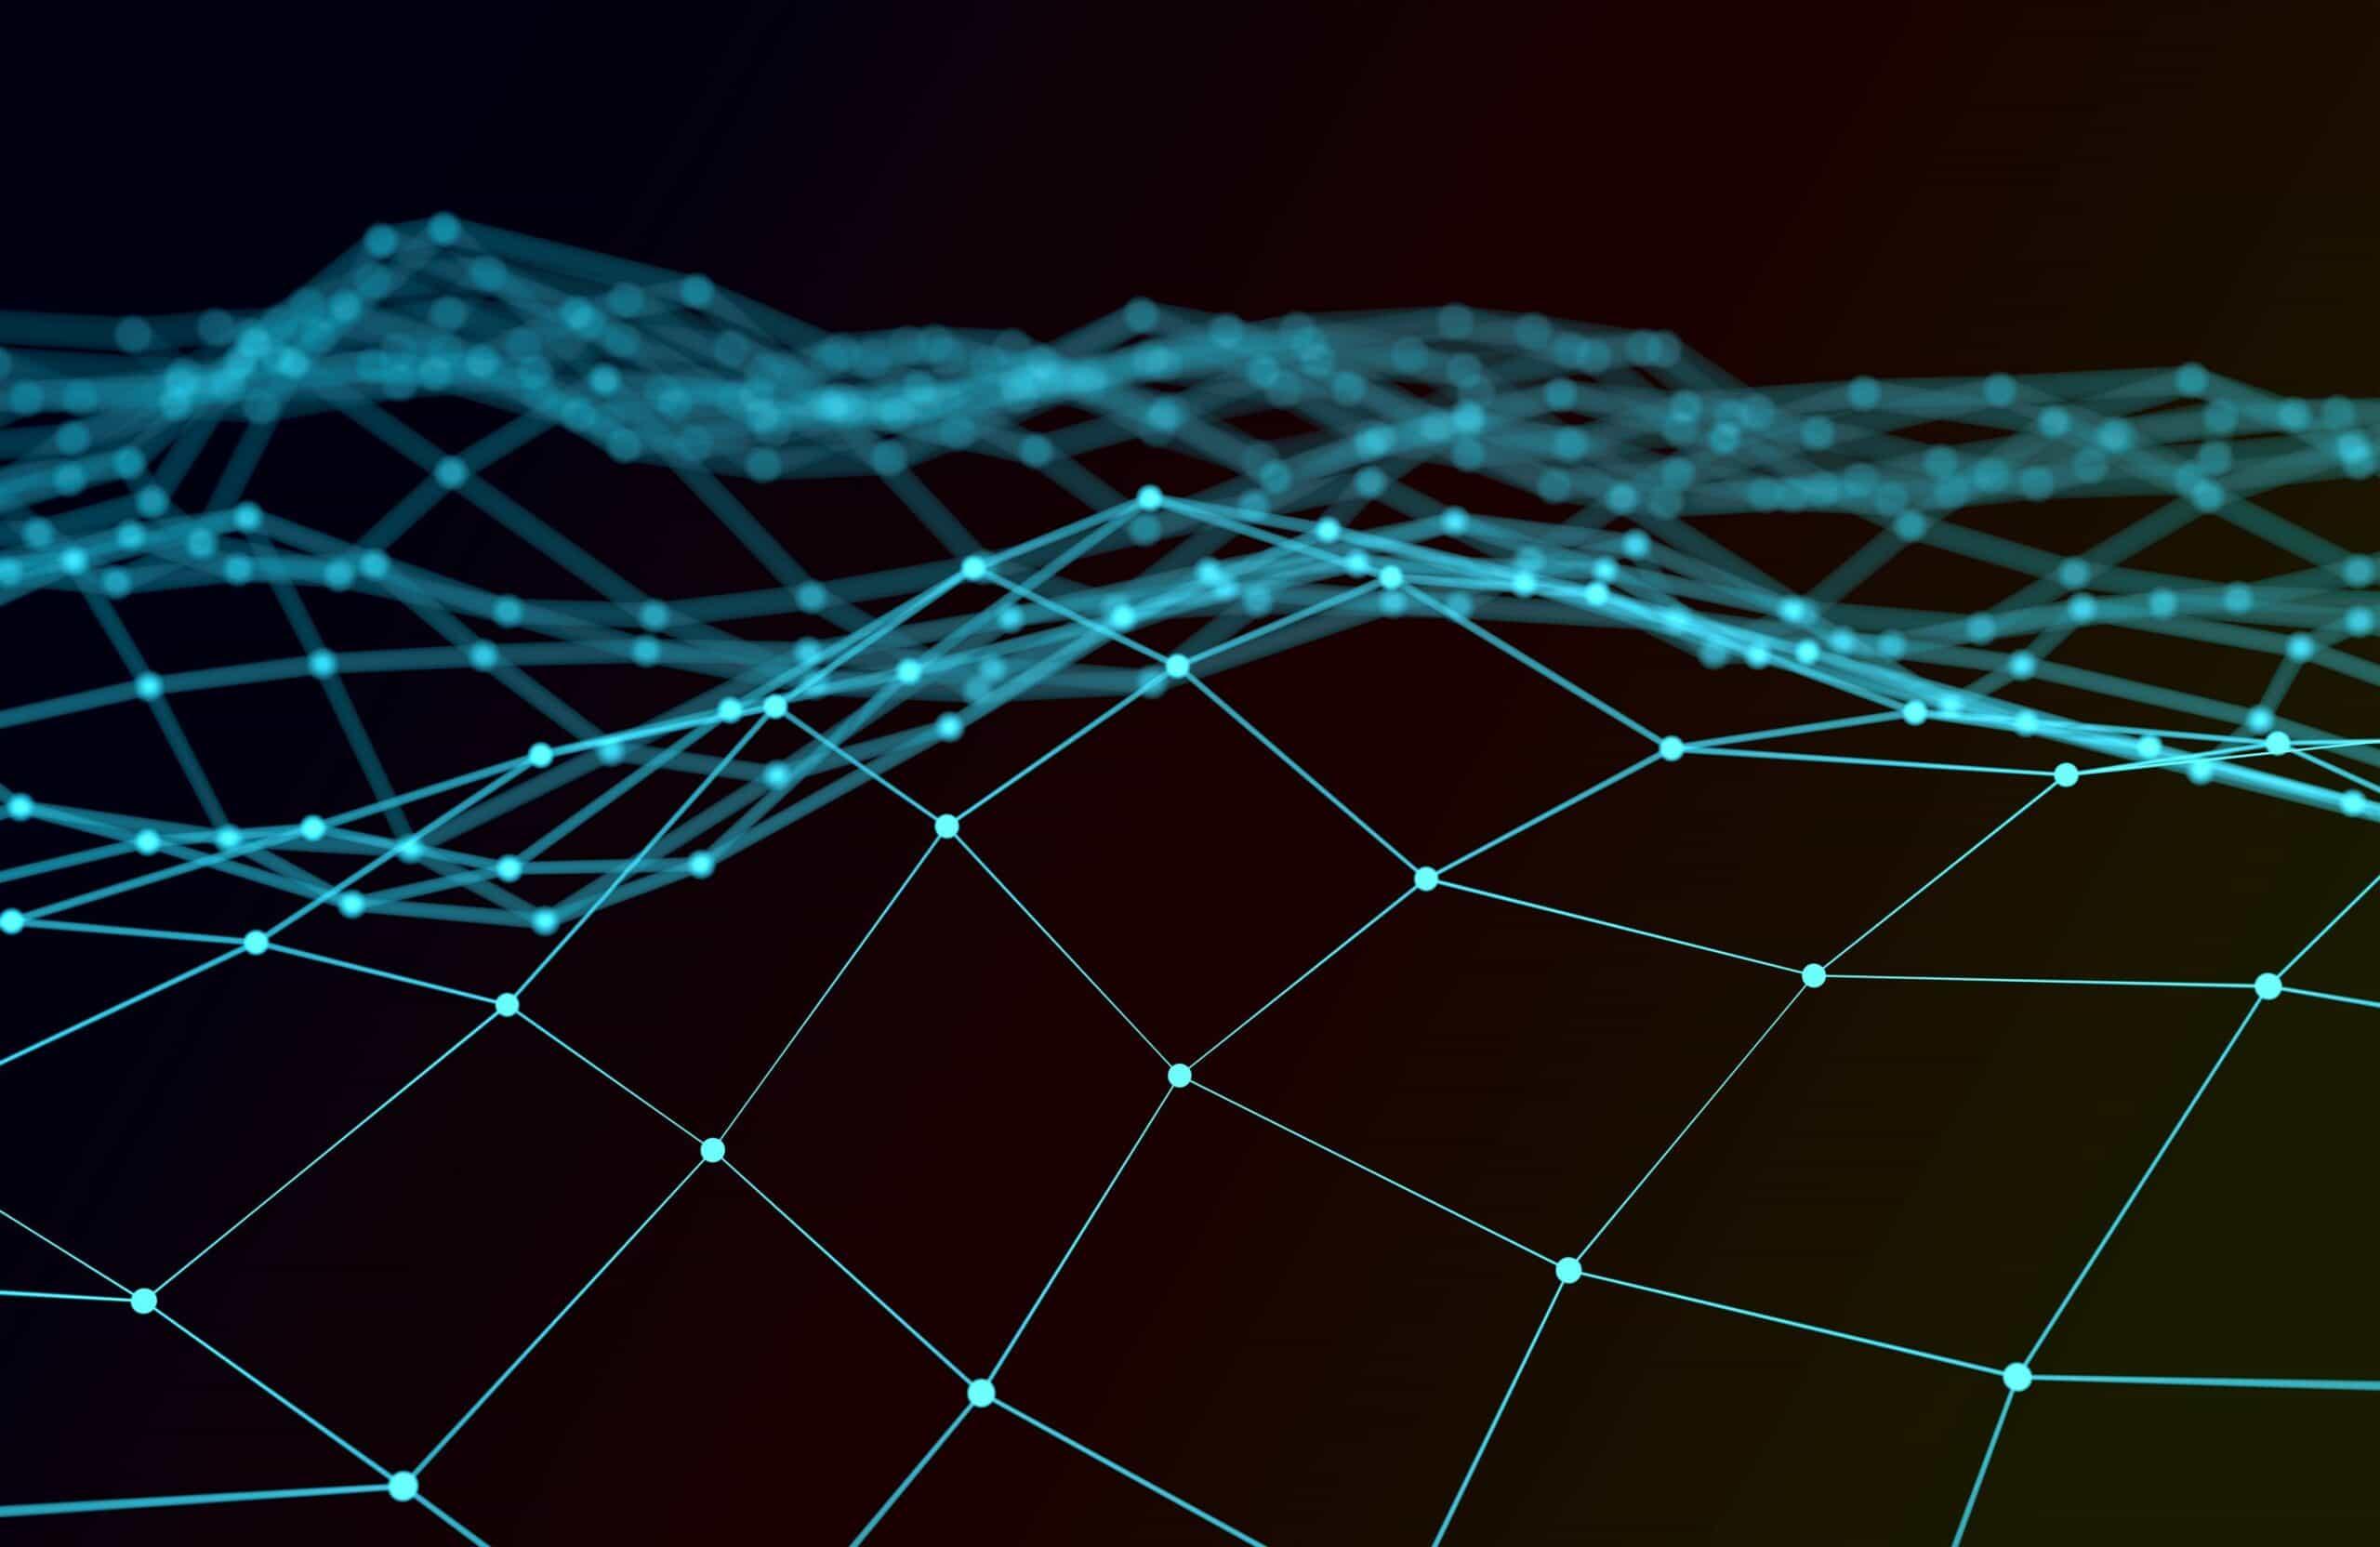 Illustration representing blockchain